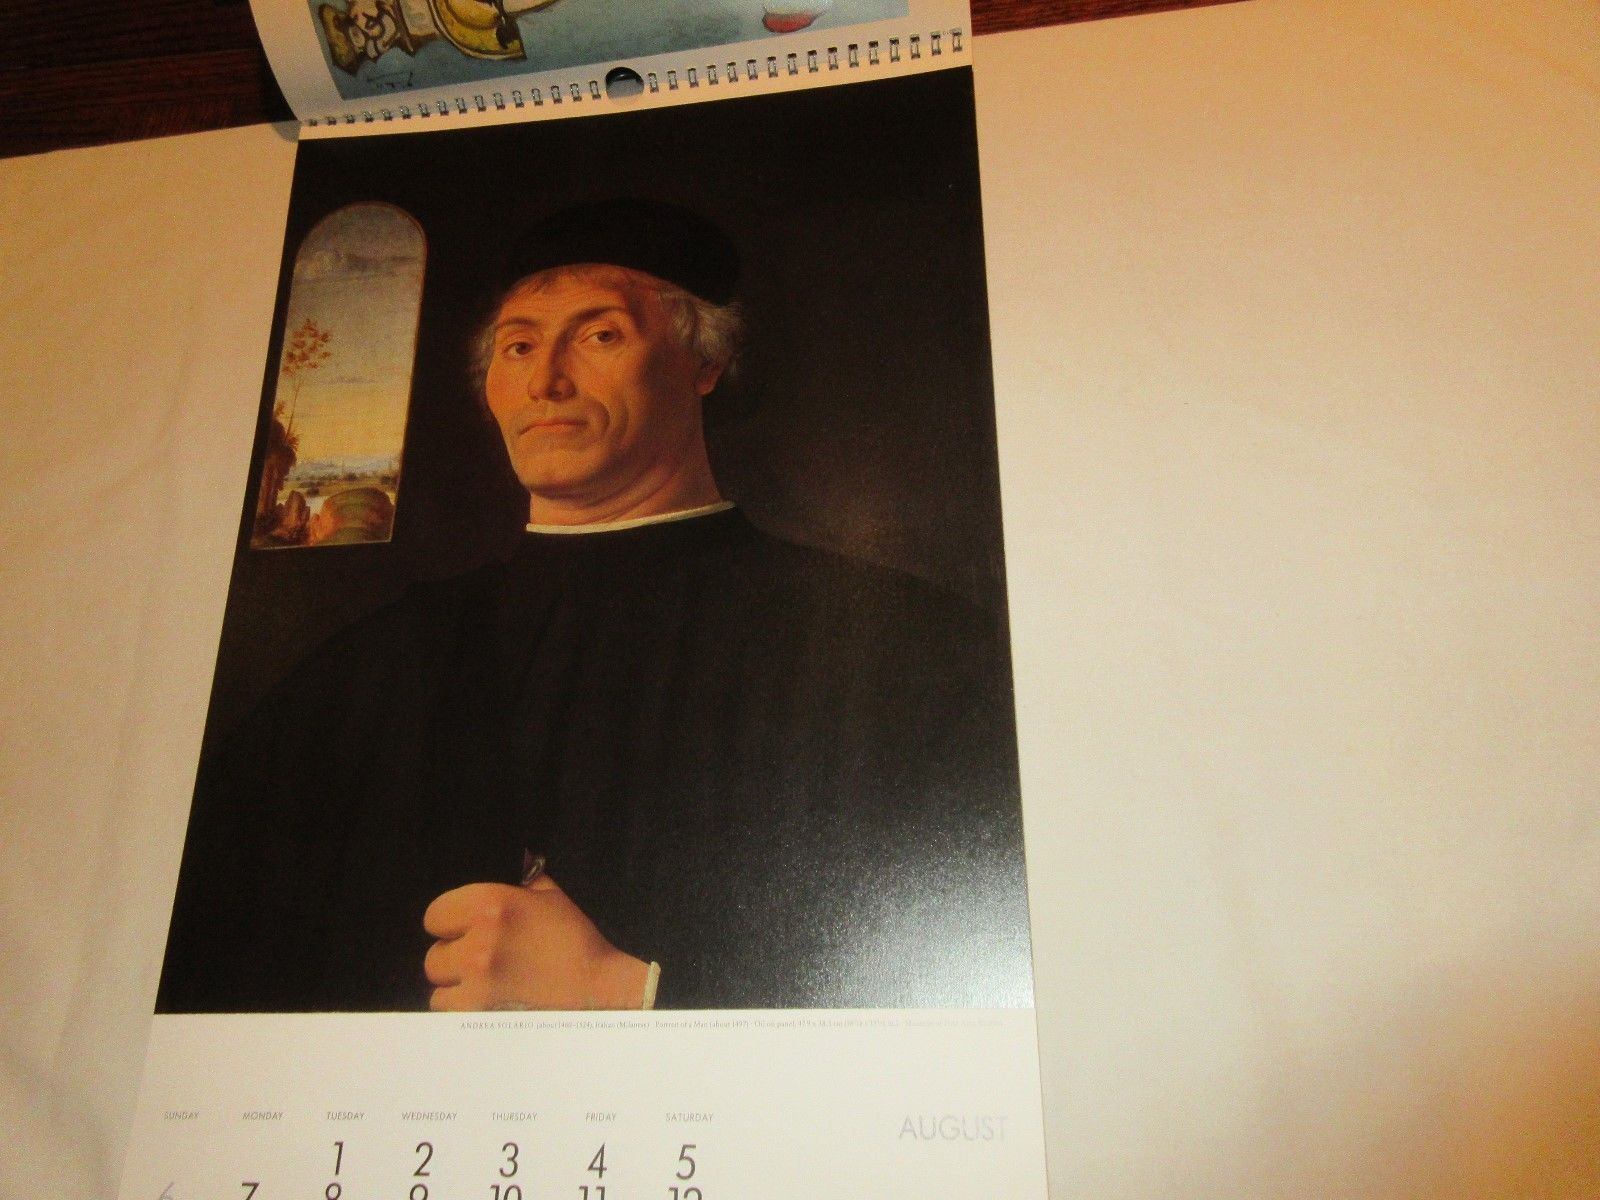 Rx , Pharmacy , Calendar , Hoechst-Roussel Pharmaceuticals Inc.,1989 , Vintage image 5